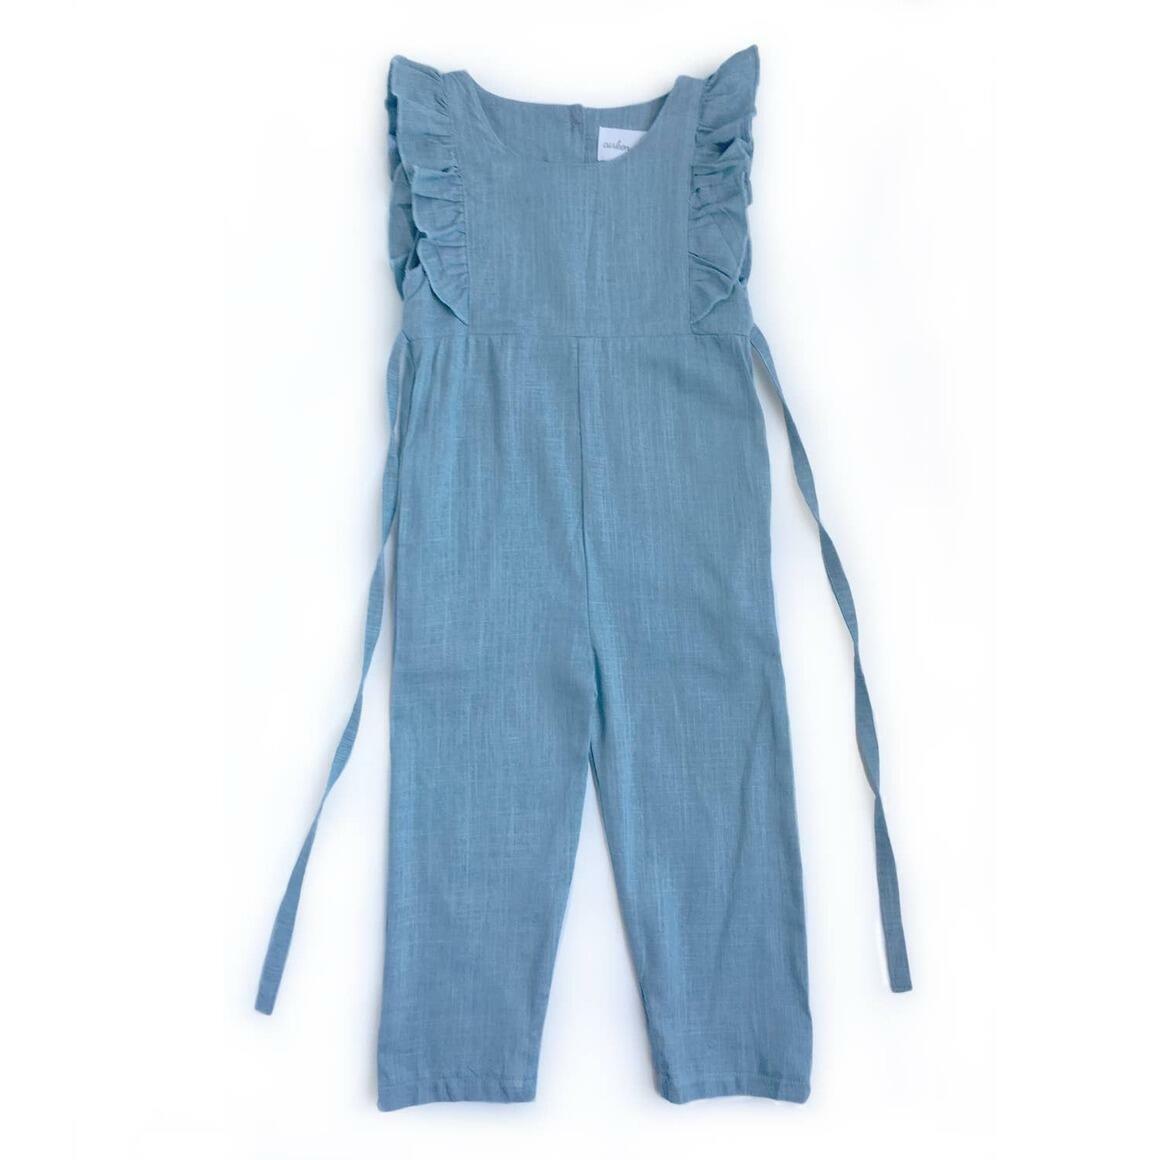 Medium Blue Linen Ruffle Romper with Pants - PREORDER | Trada Marketplace